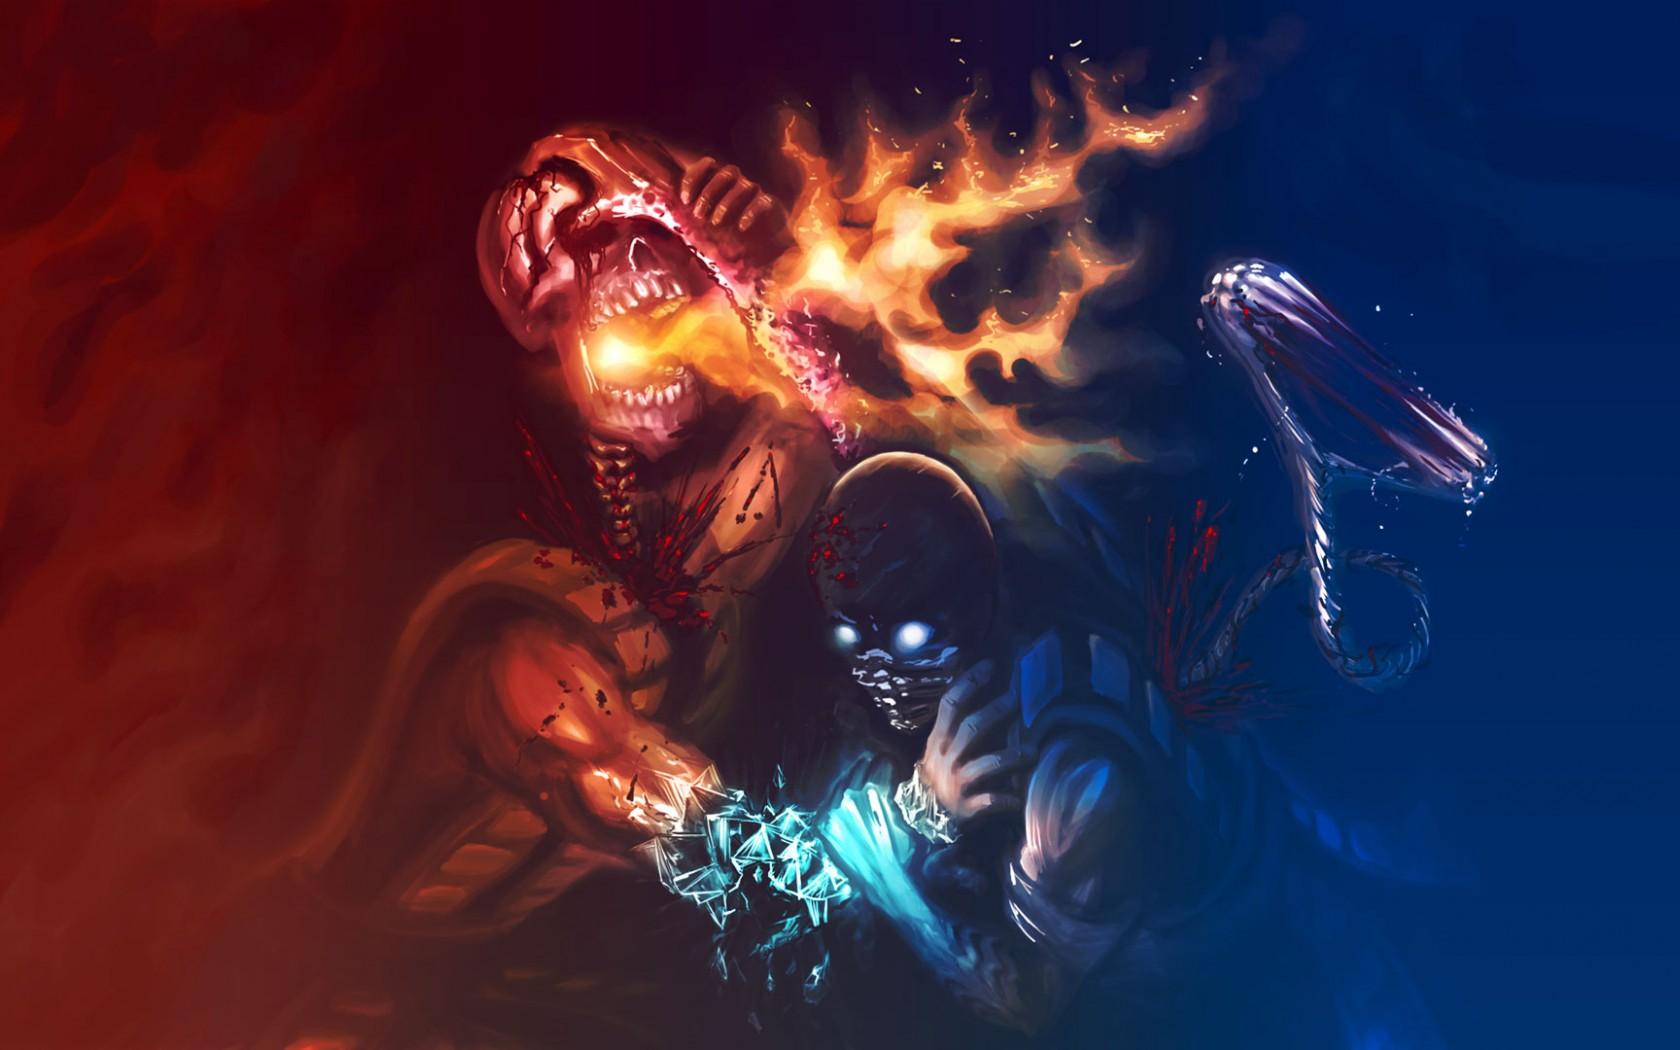 Sub Zero Mortal Kombat Scorpion ART Flame Darkness Screenshot Computer Wallpaper Fictional Character Special Effects Confrontation